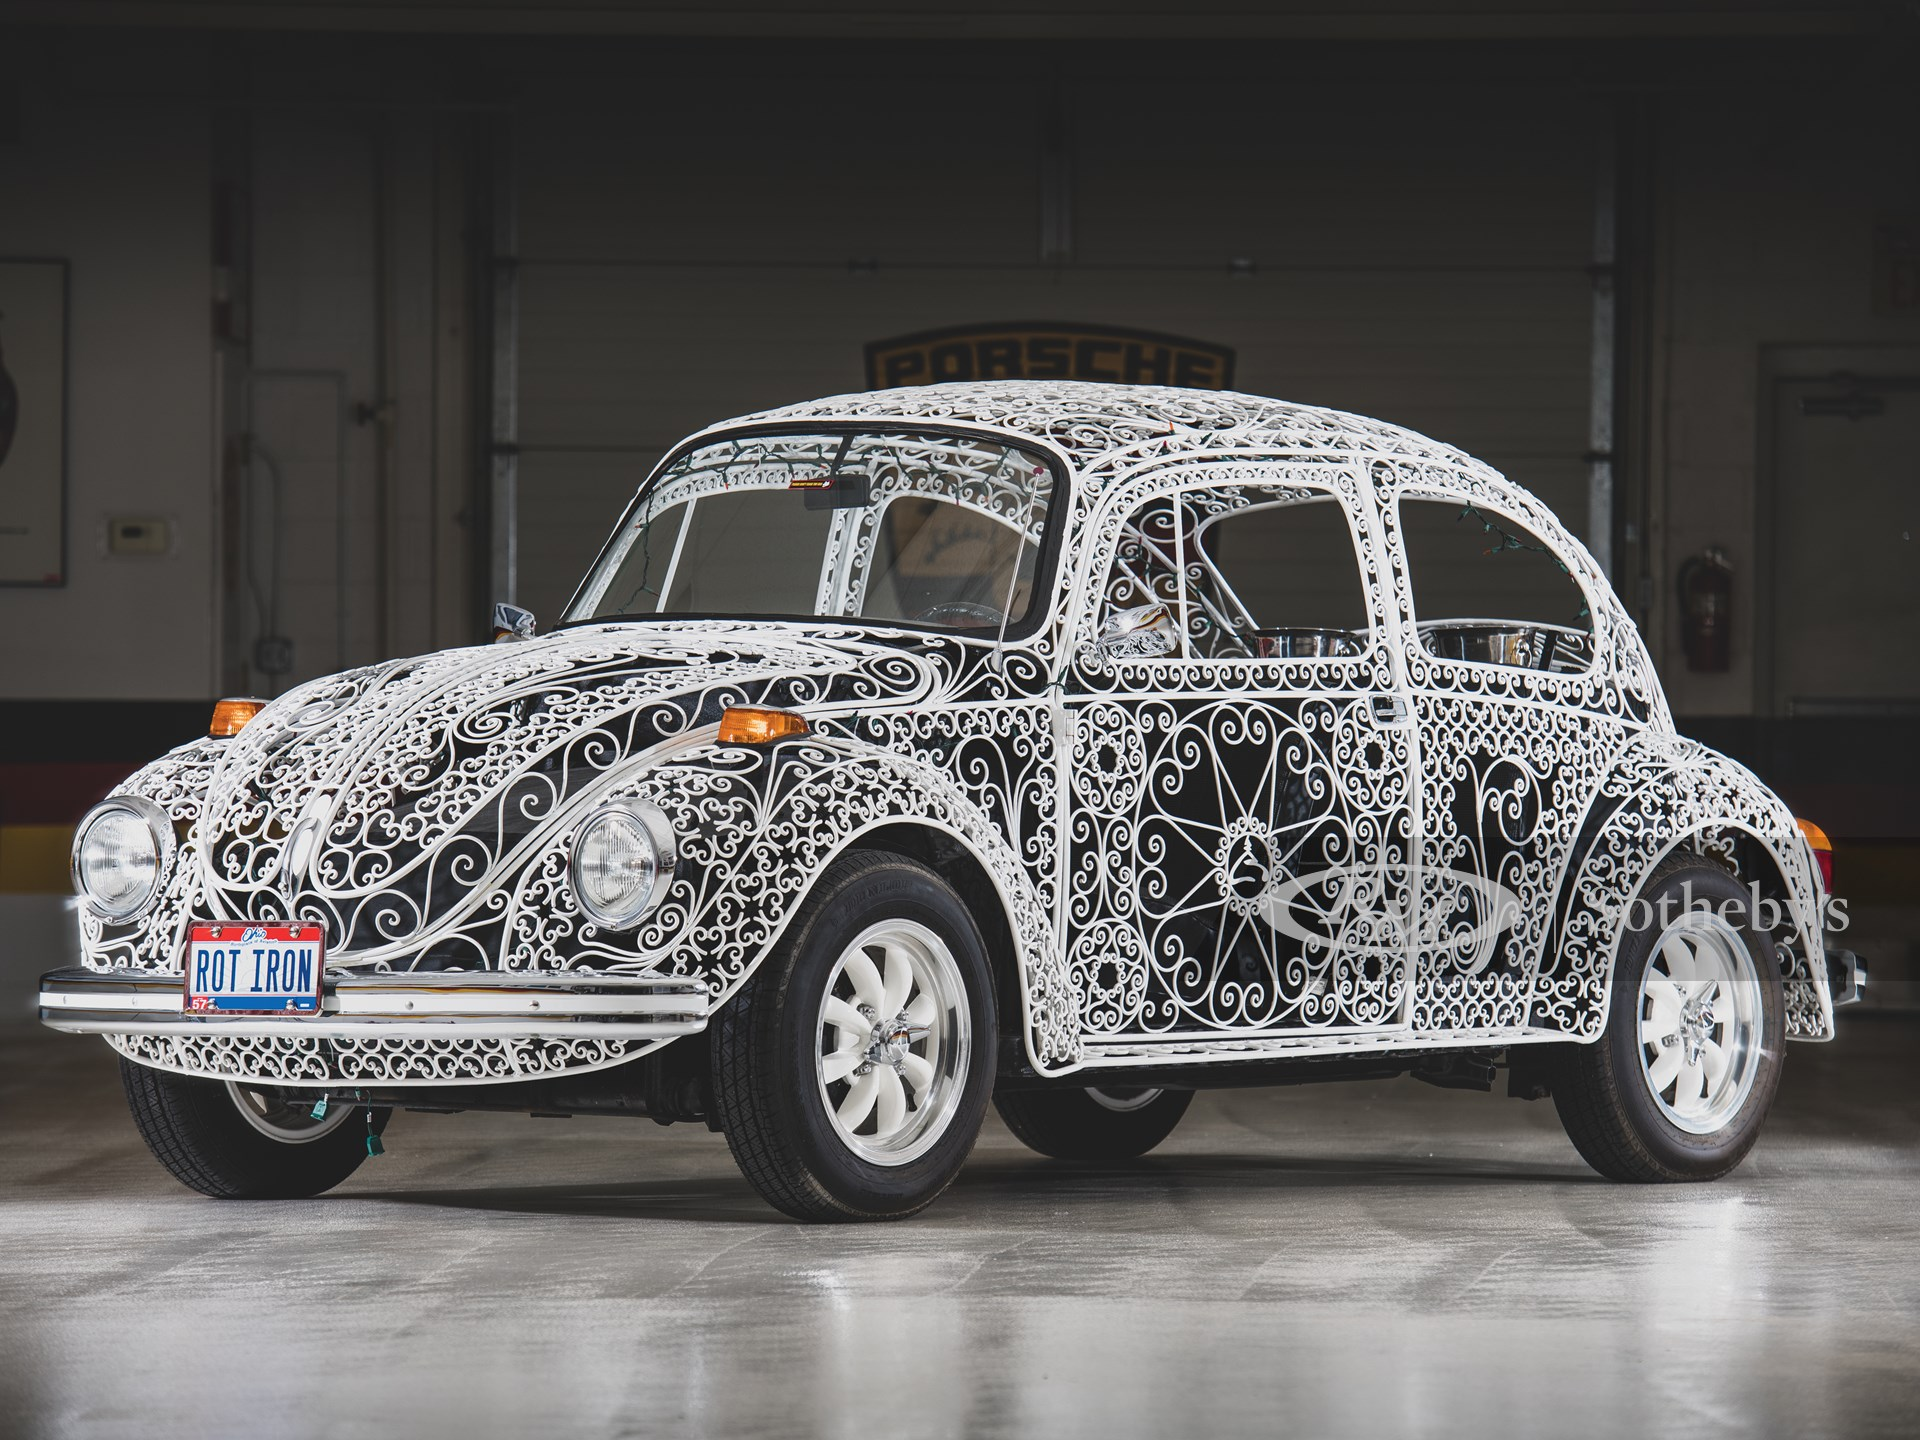 1970 Volkswagen Beetle Casa Linda Lace By Rafael Esparza Prieto The Taj Ma Garaj Collection Rm Sotheby S